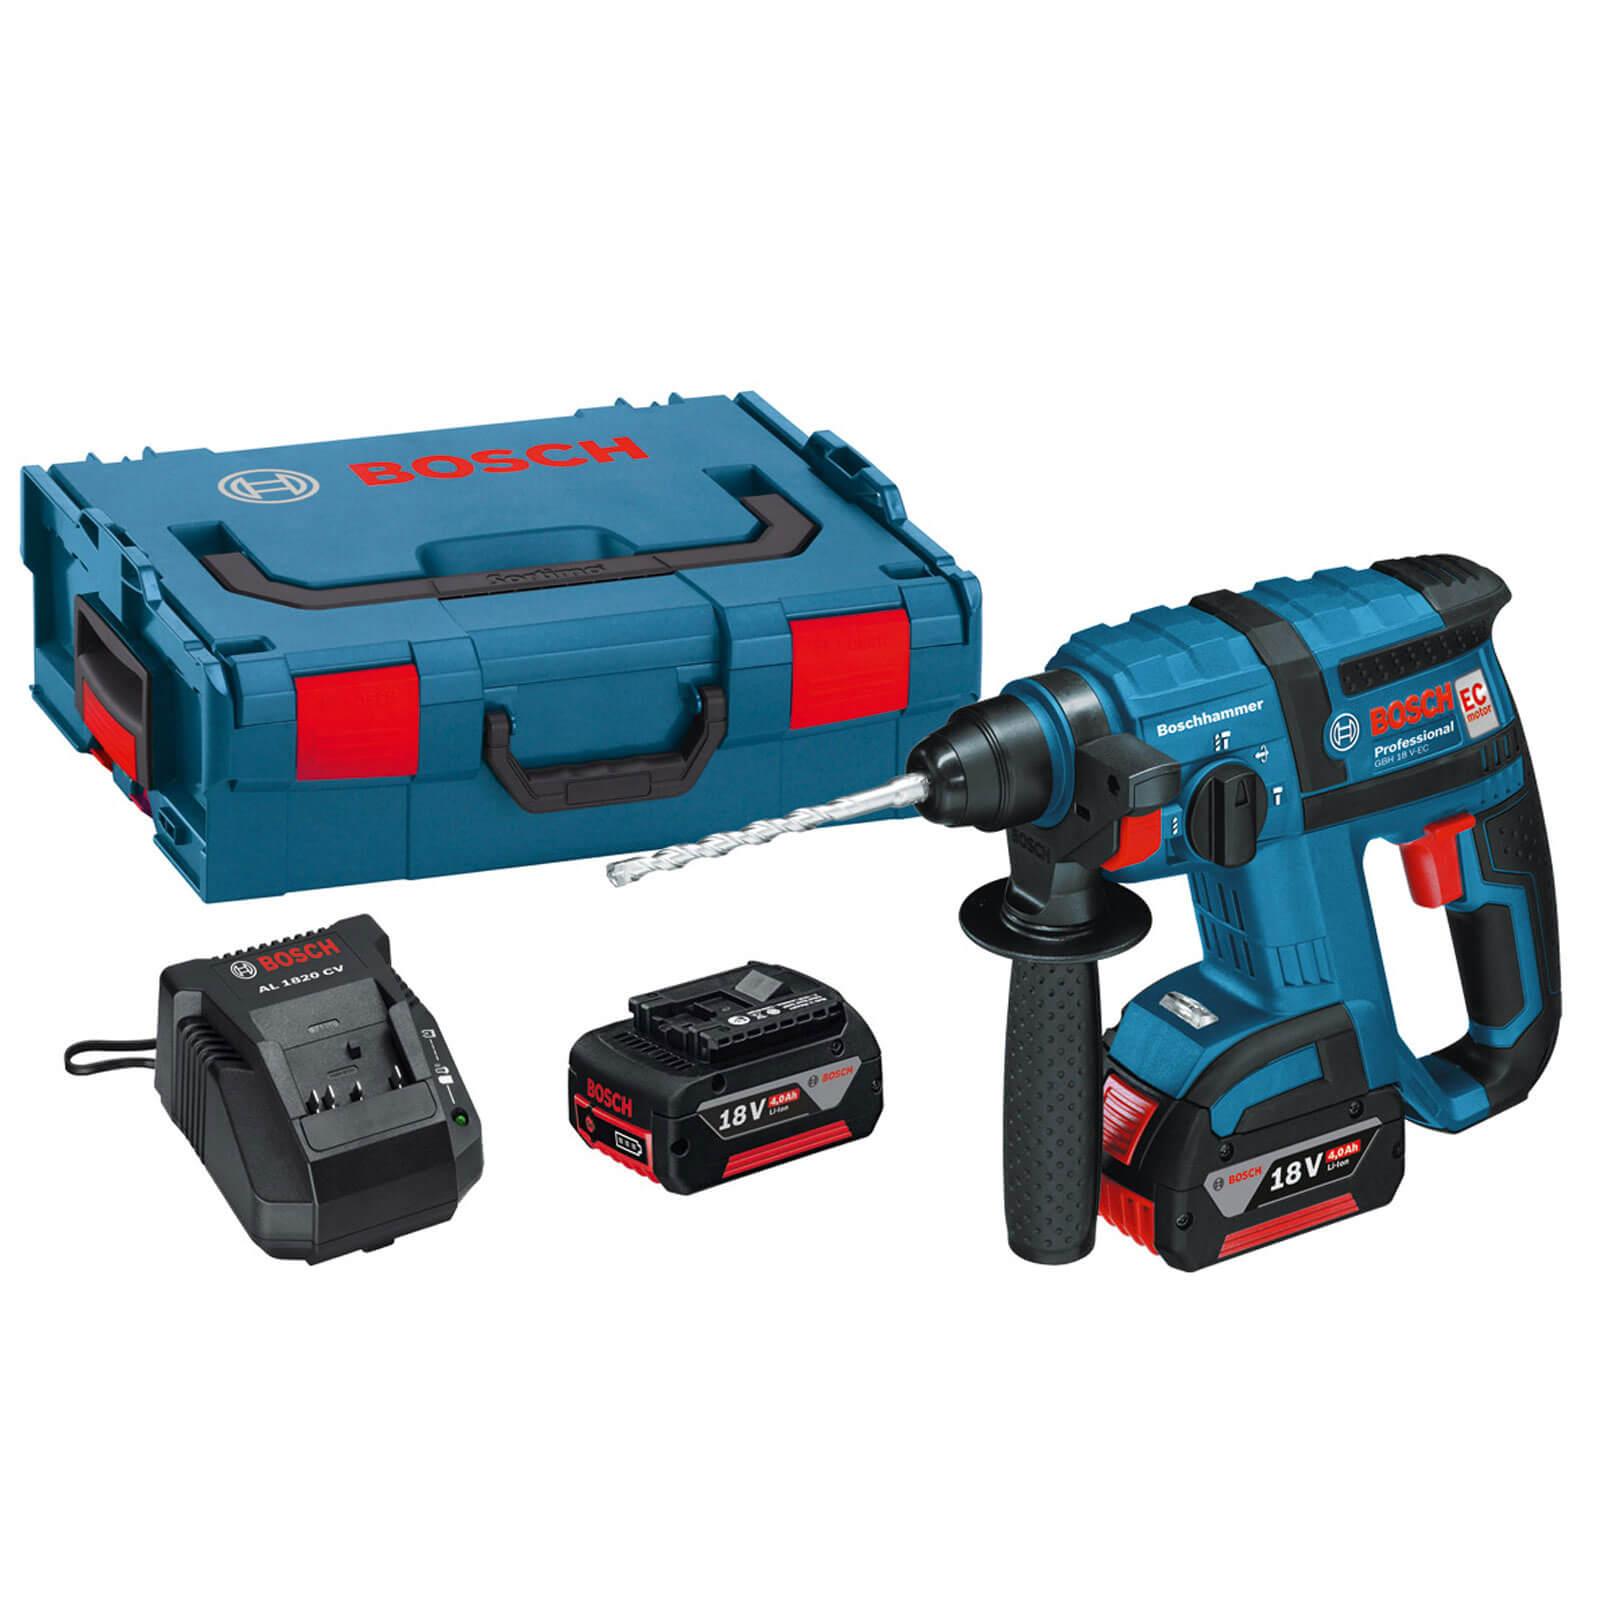 Bosch GBH 18 VEC 18v Cordless SDS Hammer Drill with L Boxx & 1 Liion Battery 4ah